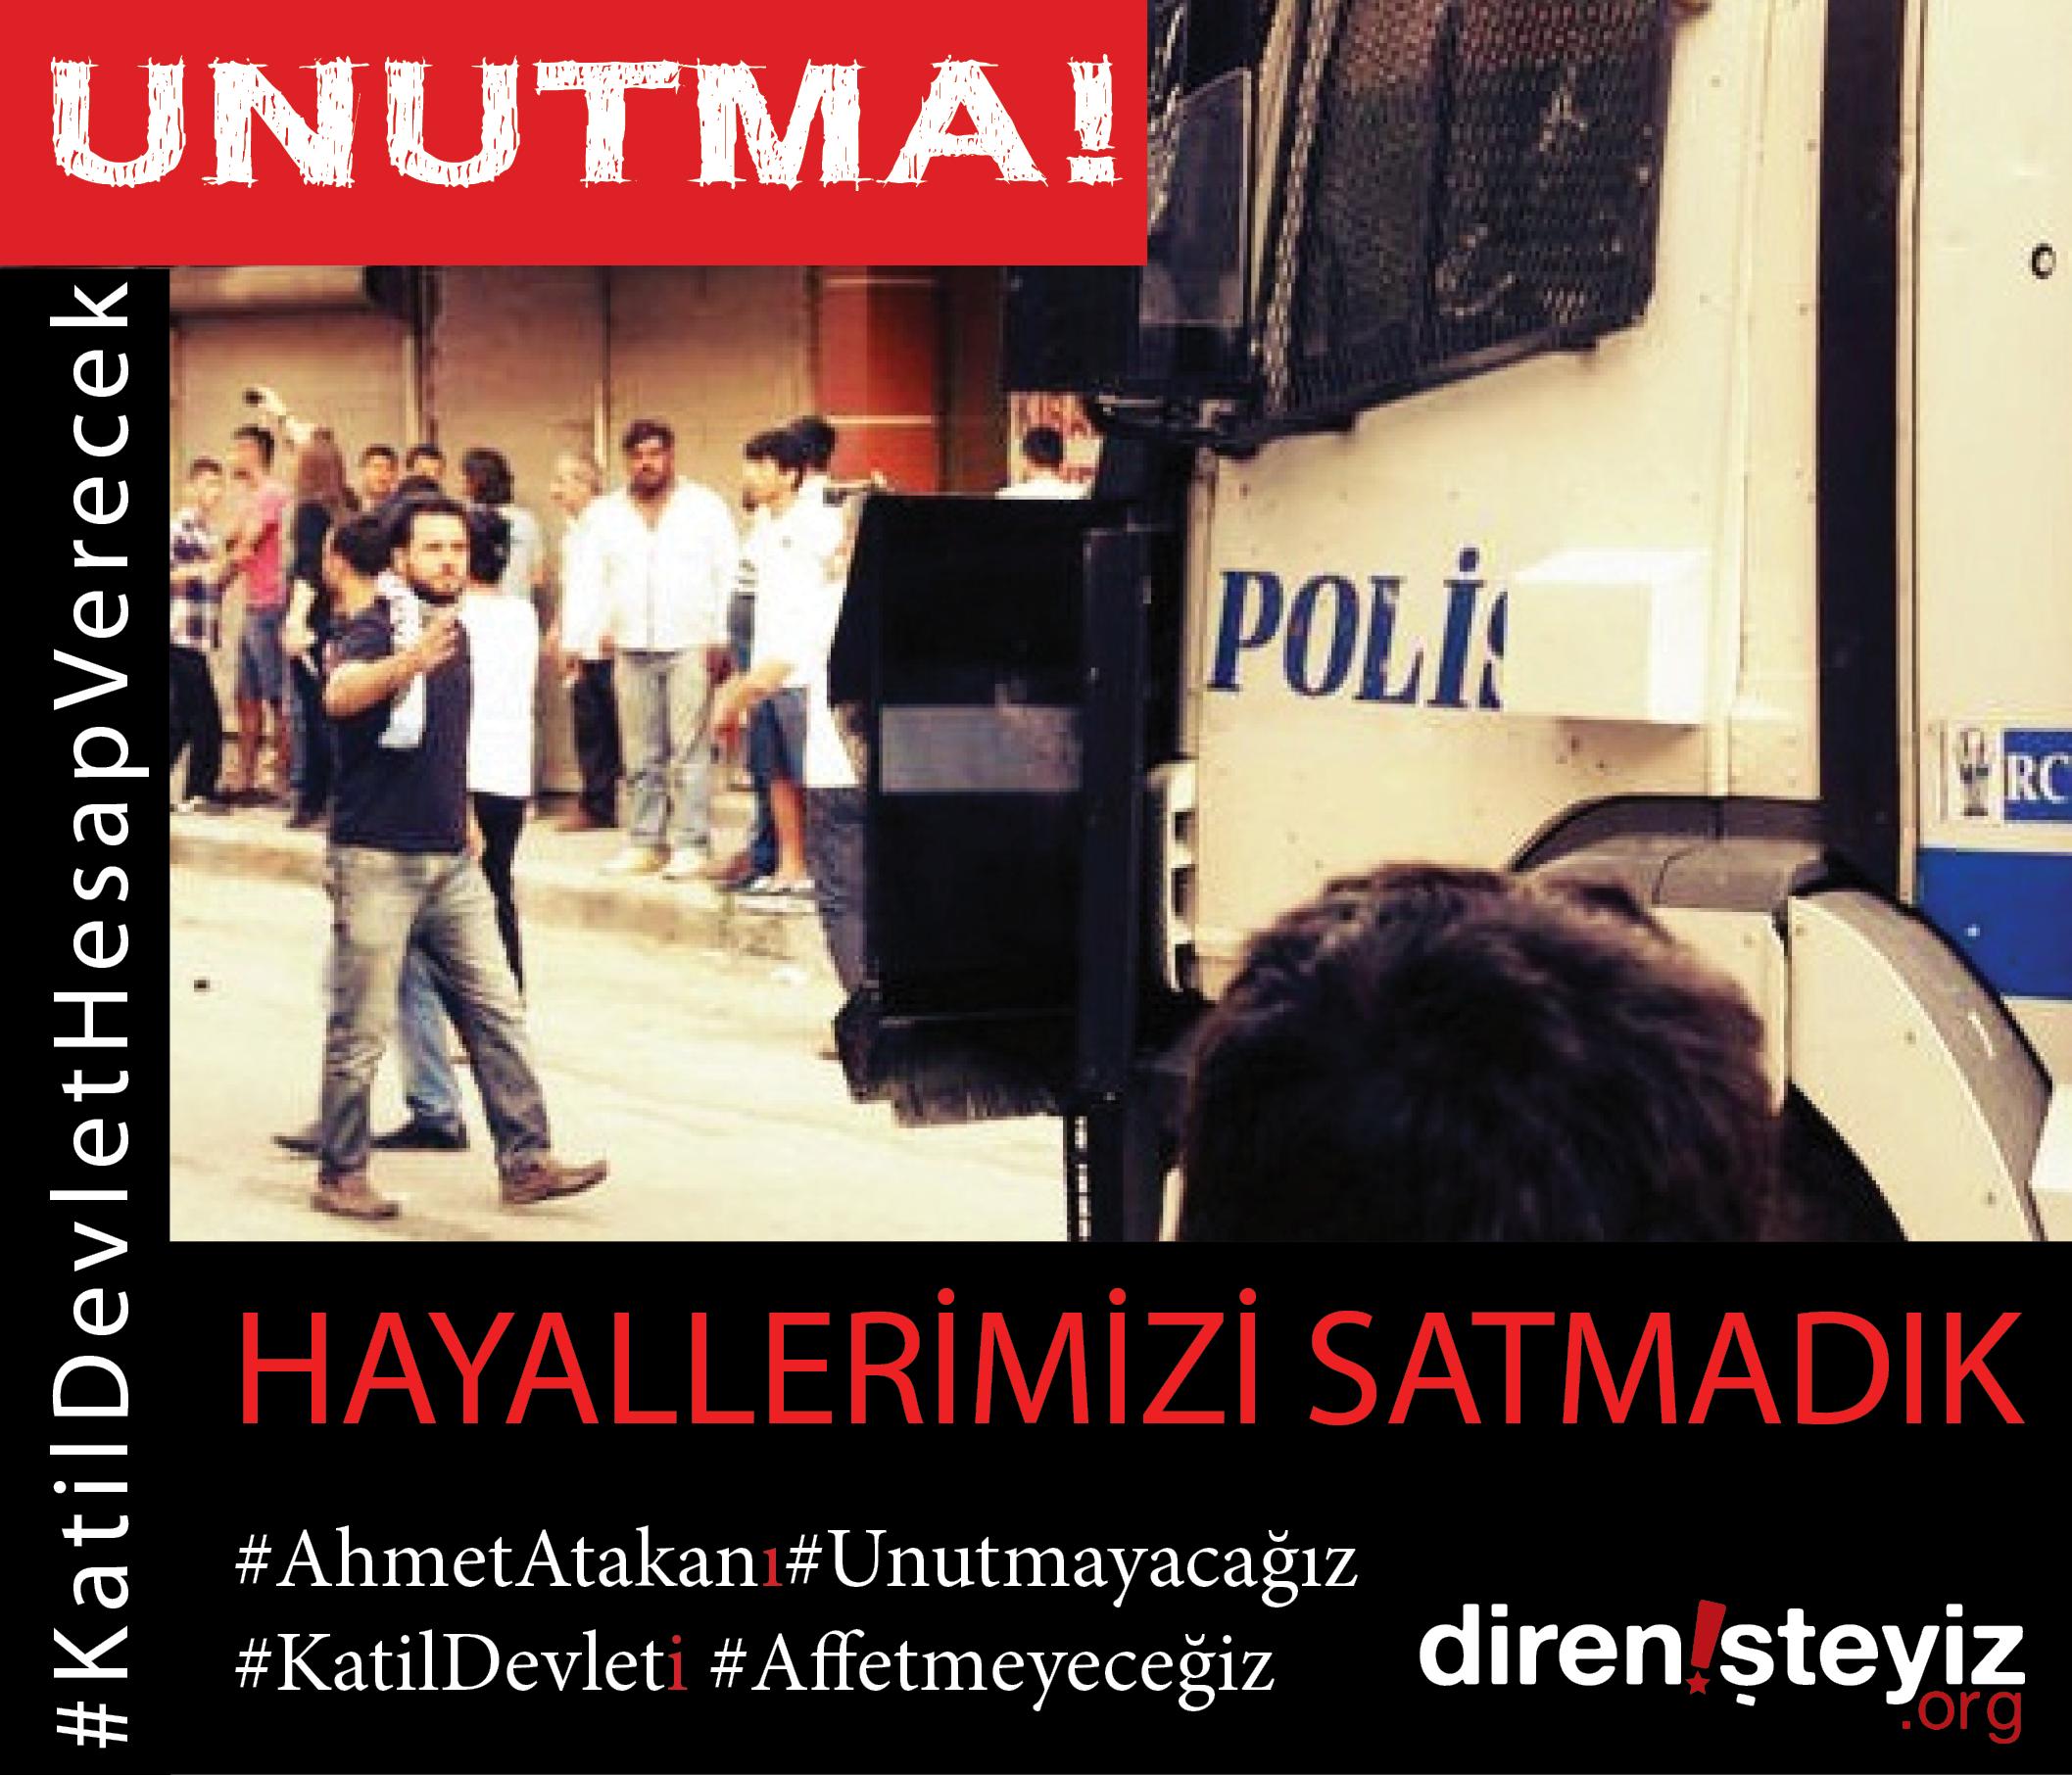 #AhmetAtakan